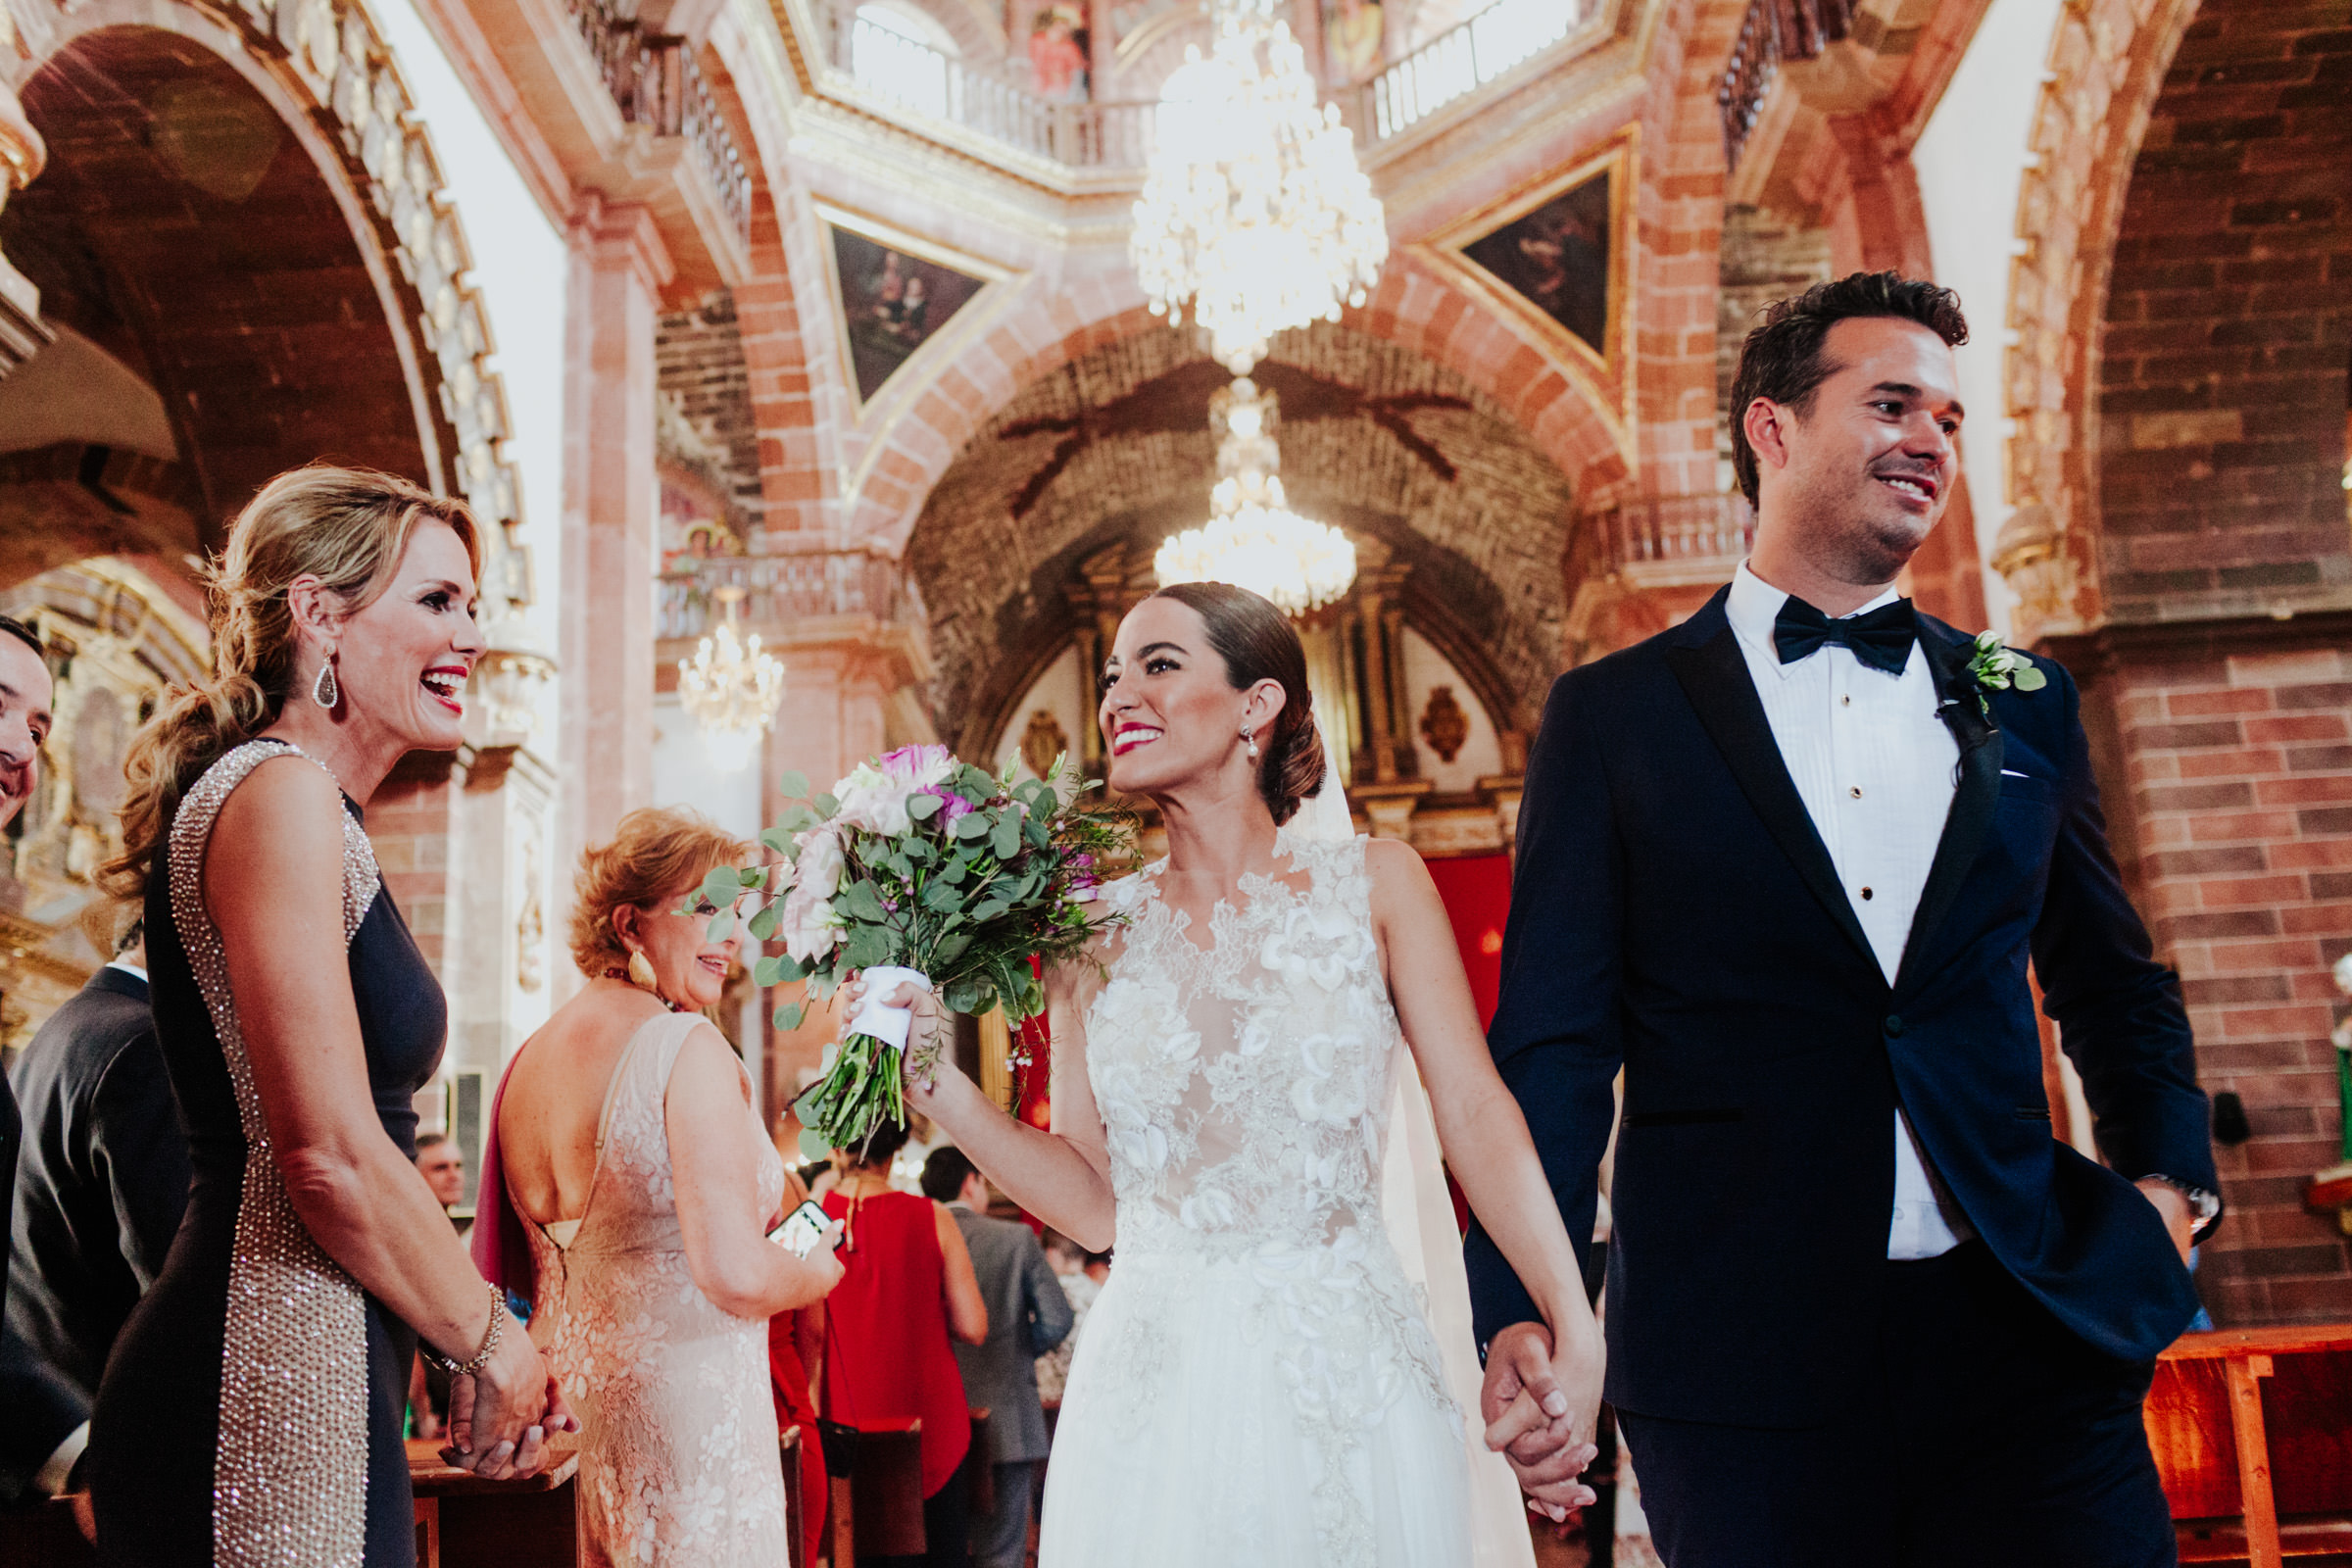 San-Miguel-de-Allende-Wedding-Photography-Parroquia-Instituto-Boda-Fotografia-Fer-Sergio-Pierce-Lifestyle-Photography0290.JPG